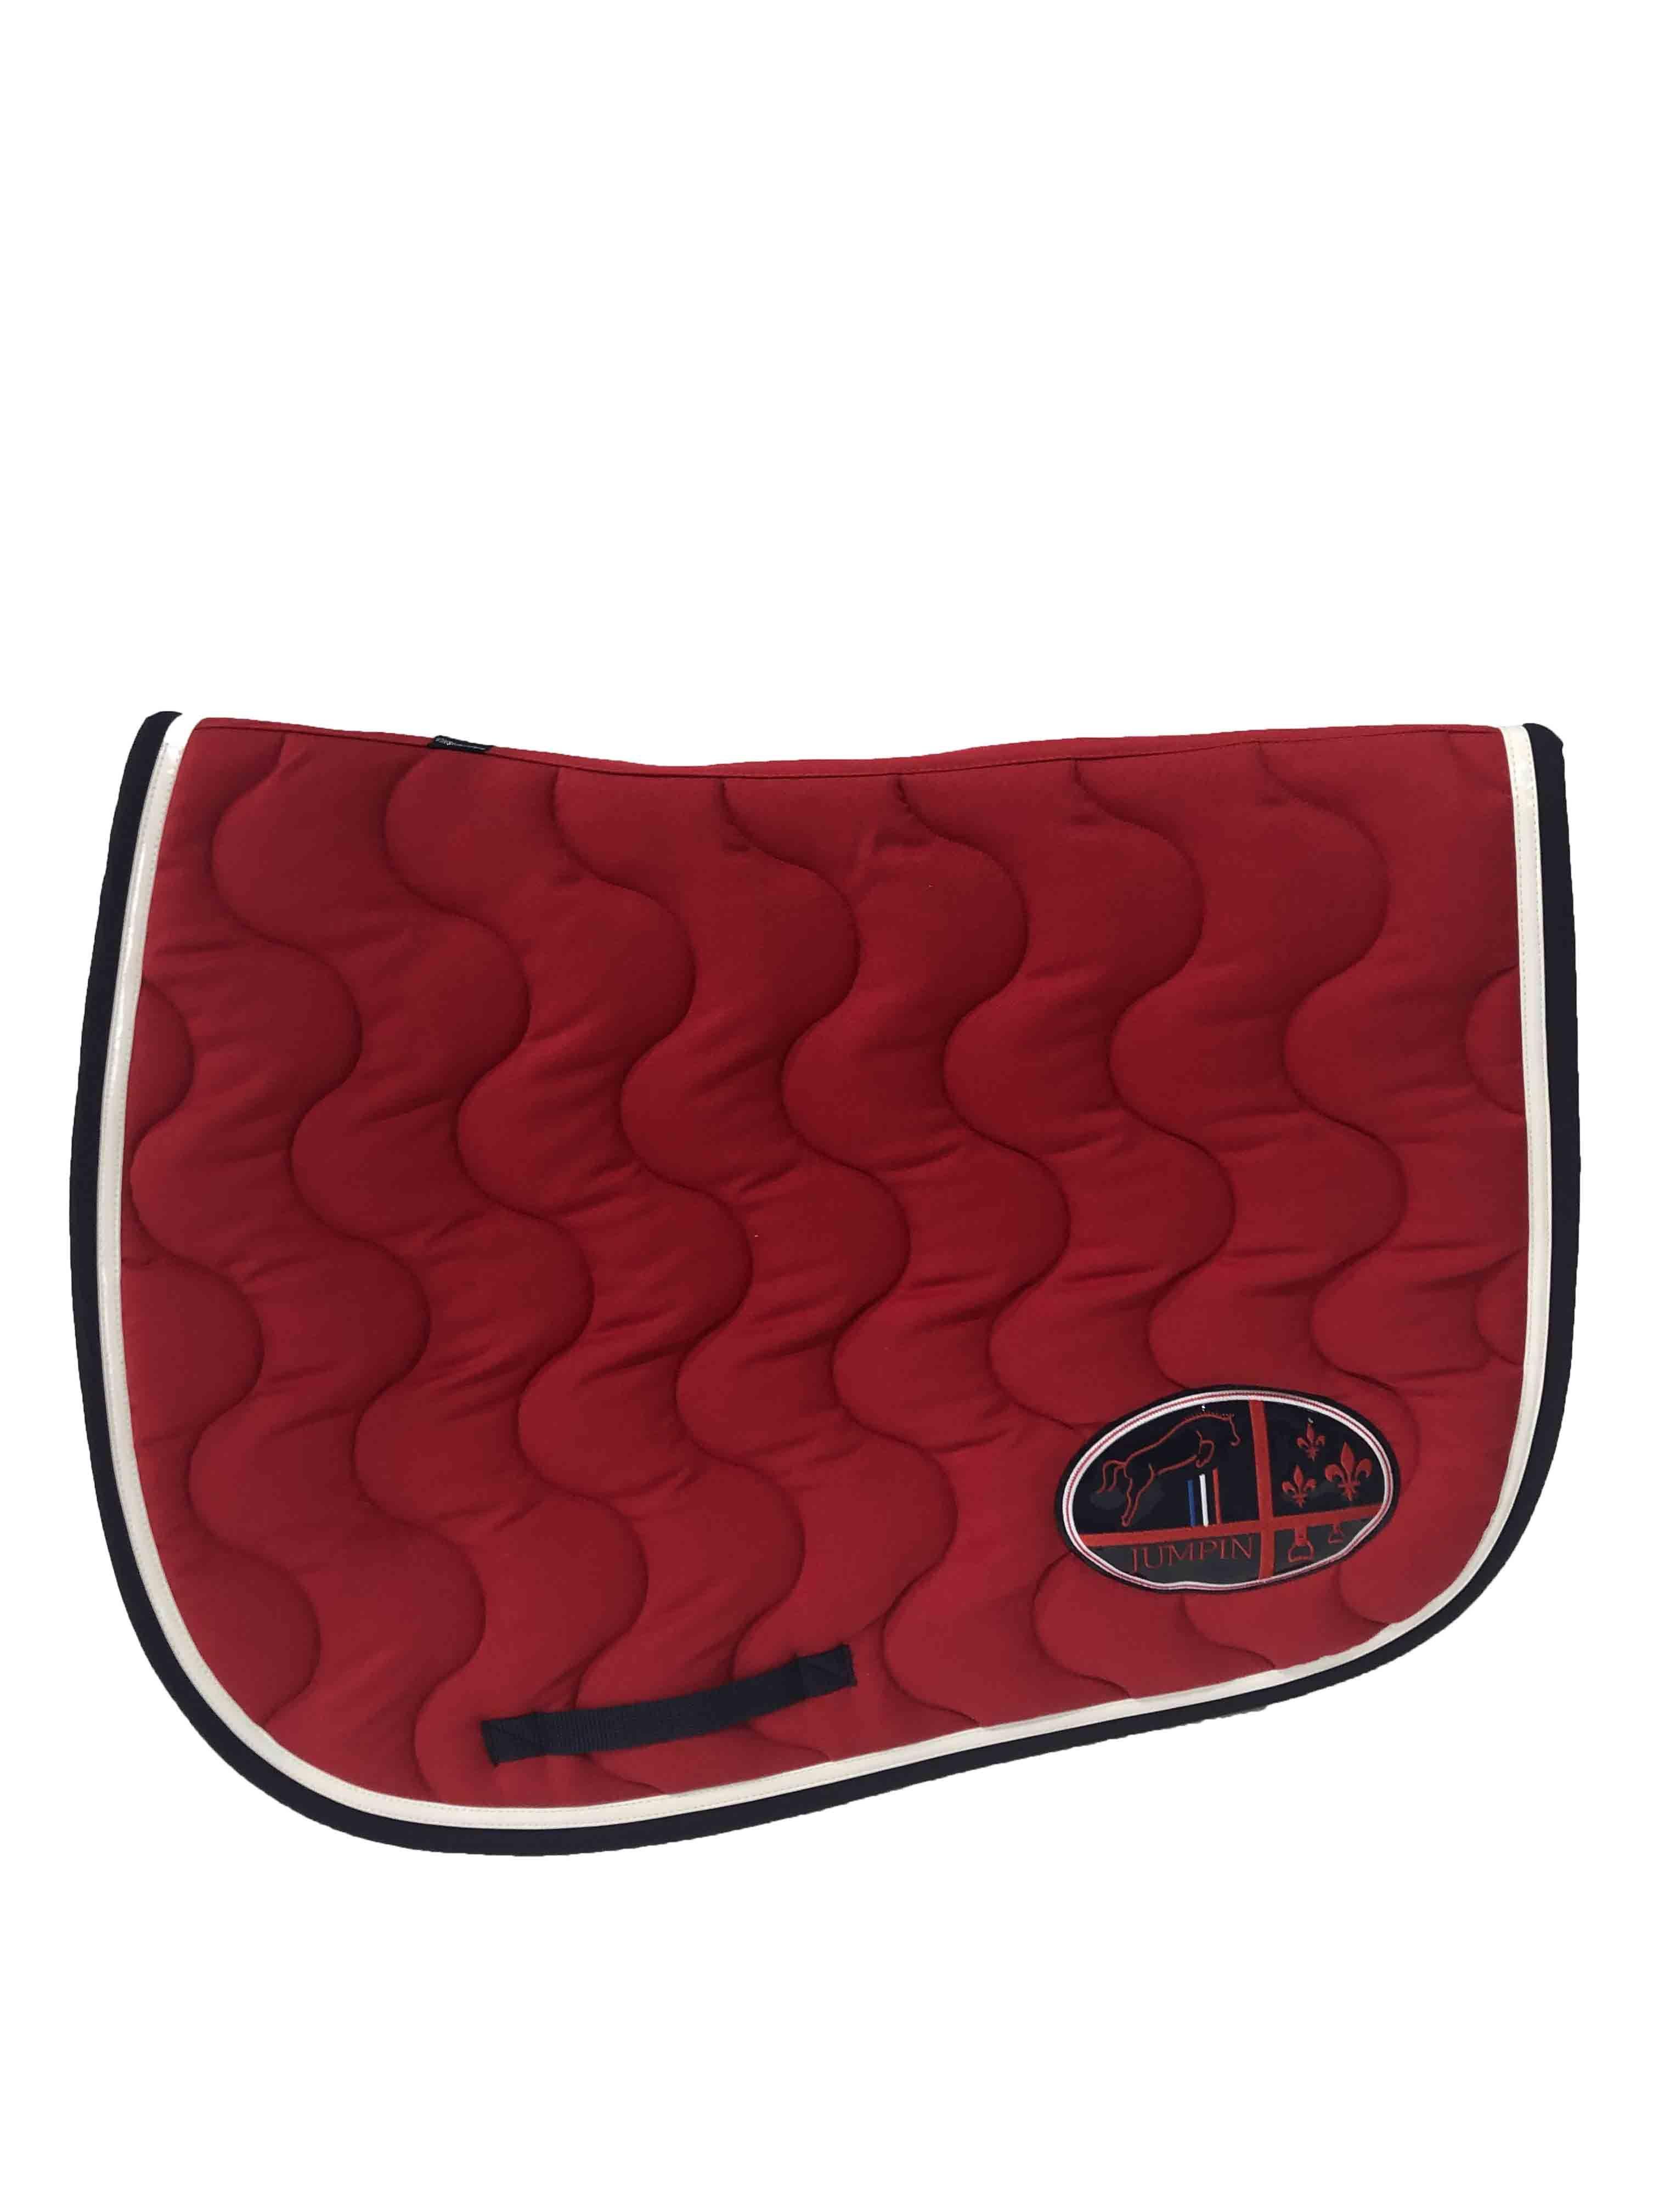 tapis de selle rouge blanc vernis bleu marine jump in boutique equitation